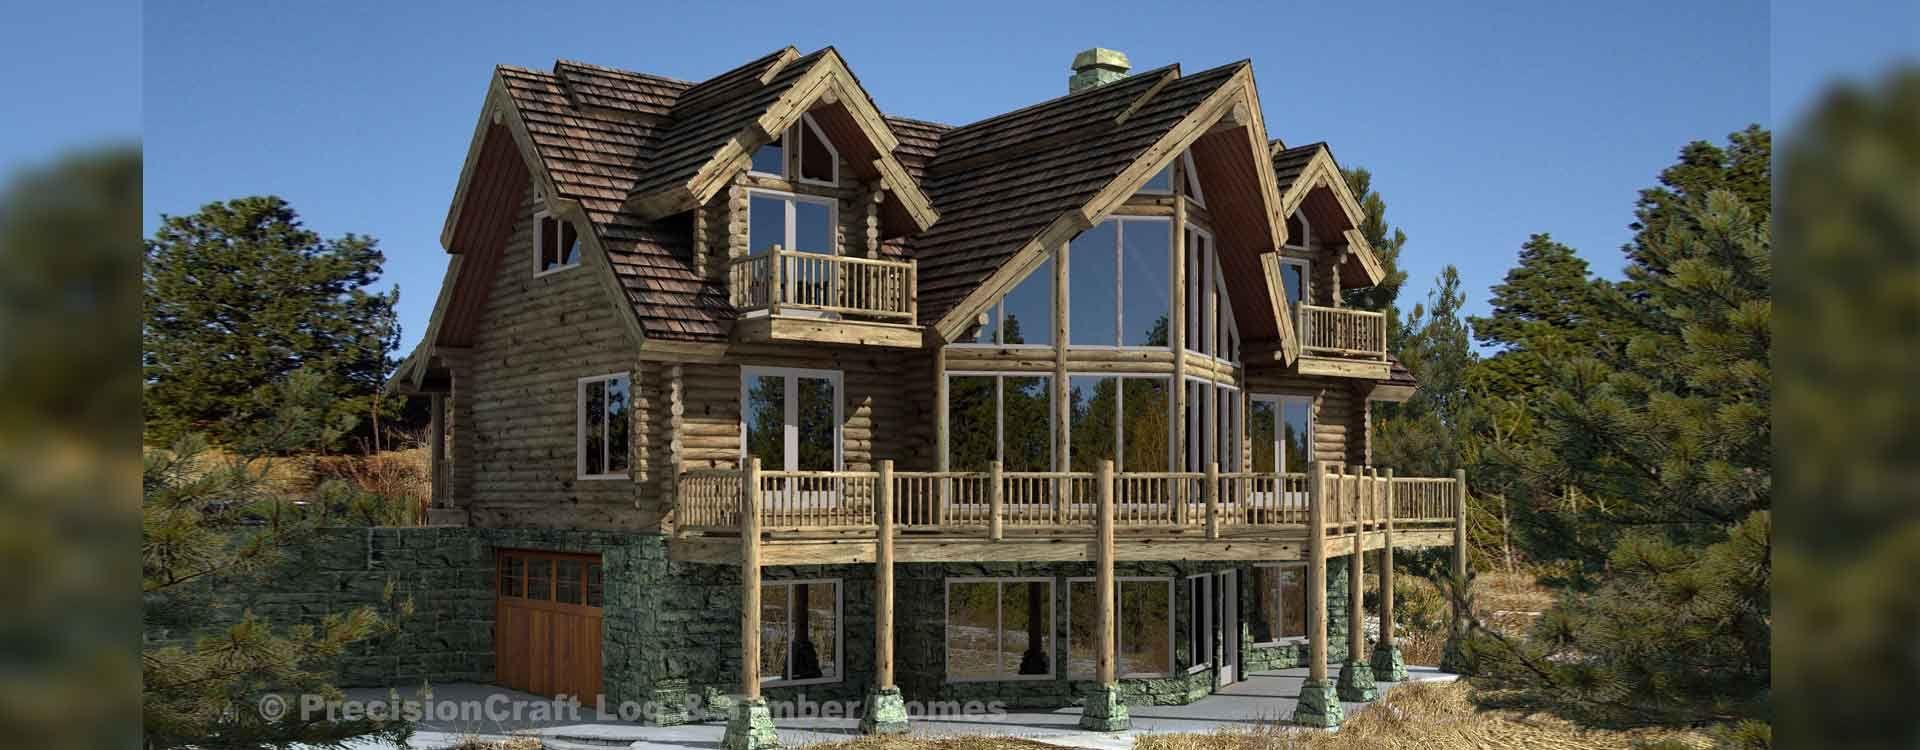 3 Bdrm With Loft Basement W Rec Room Log Cabin Homes Cabin Homes Cabin